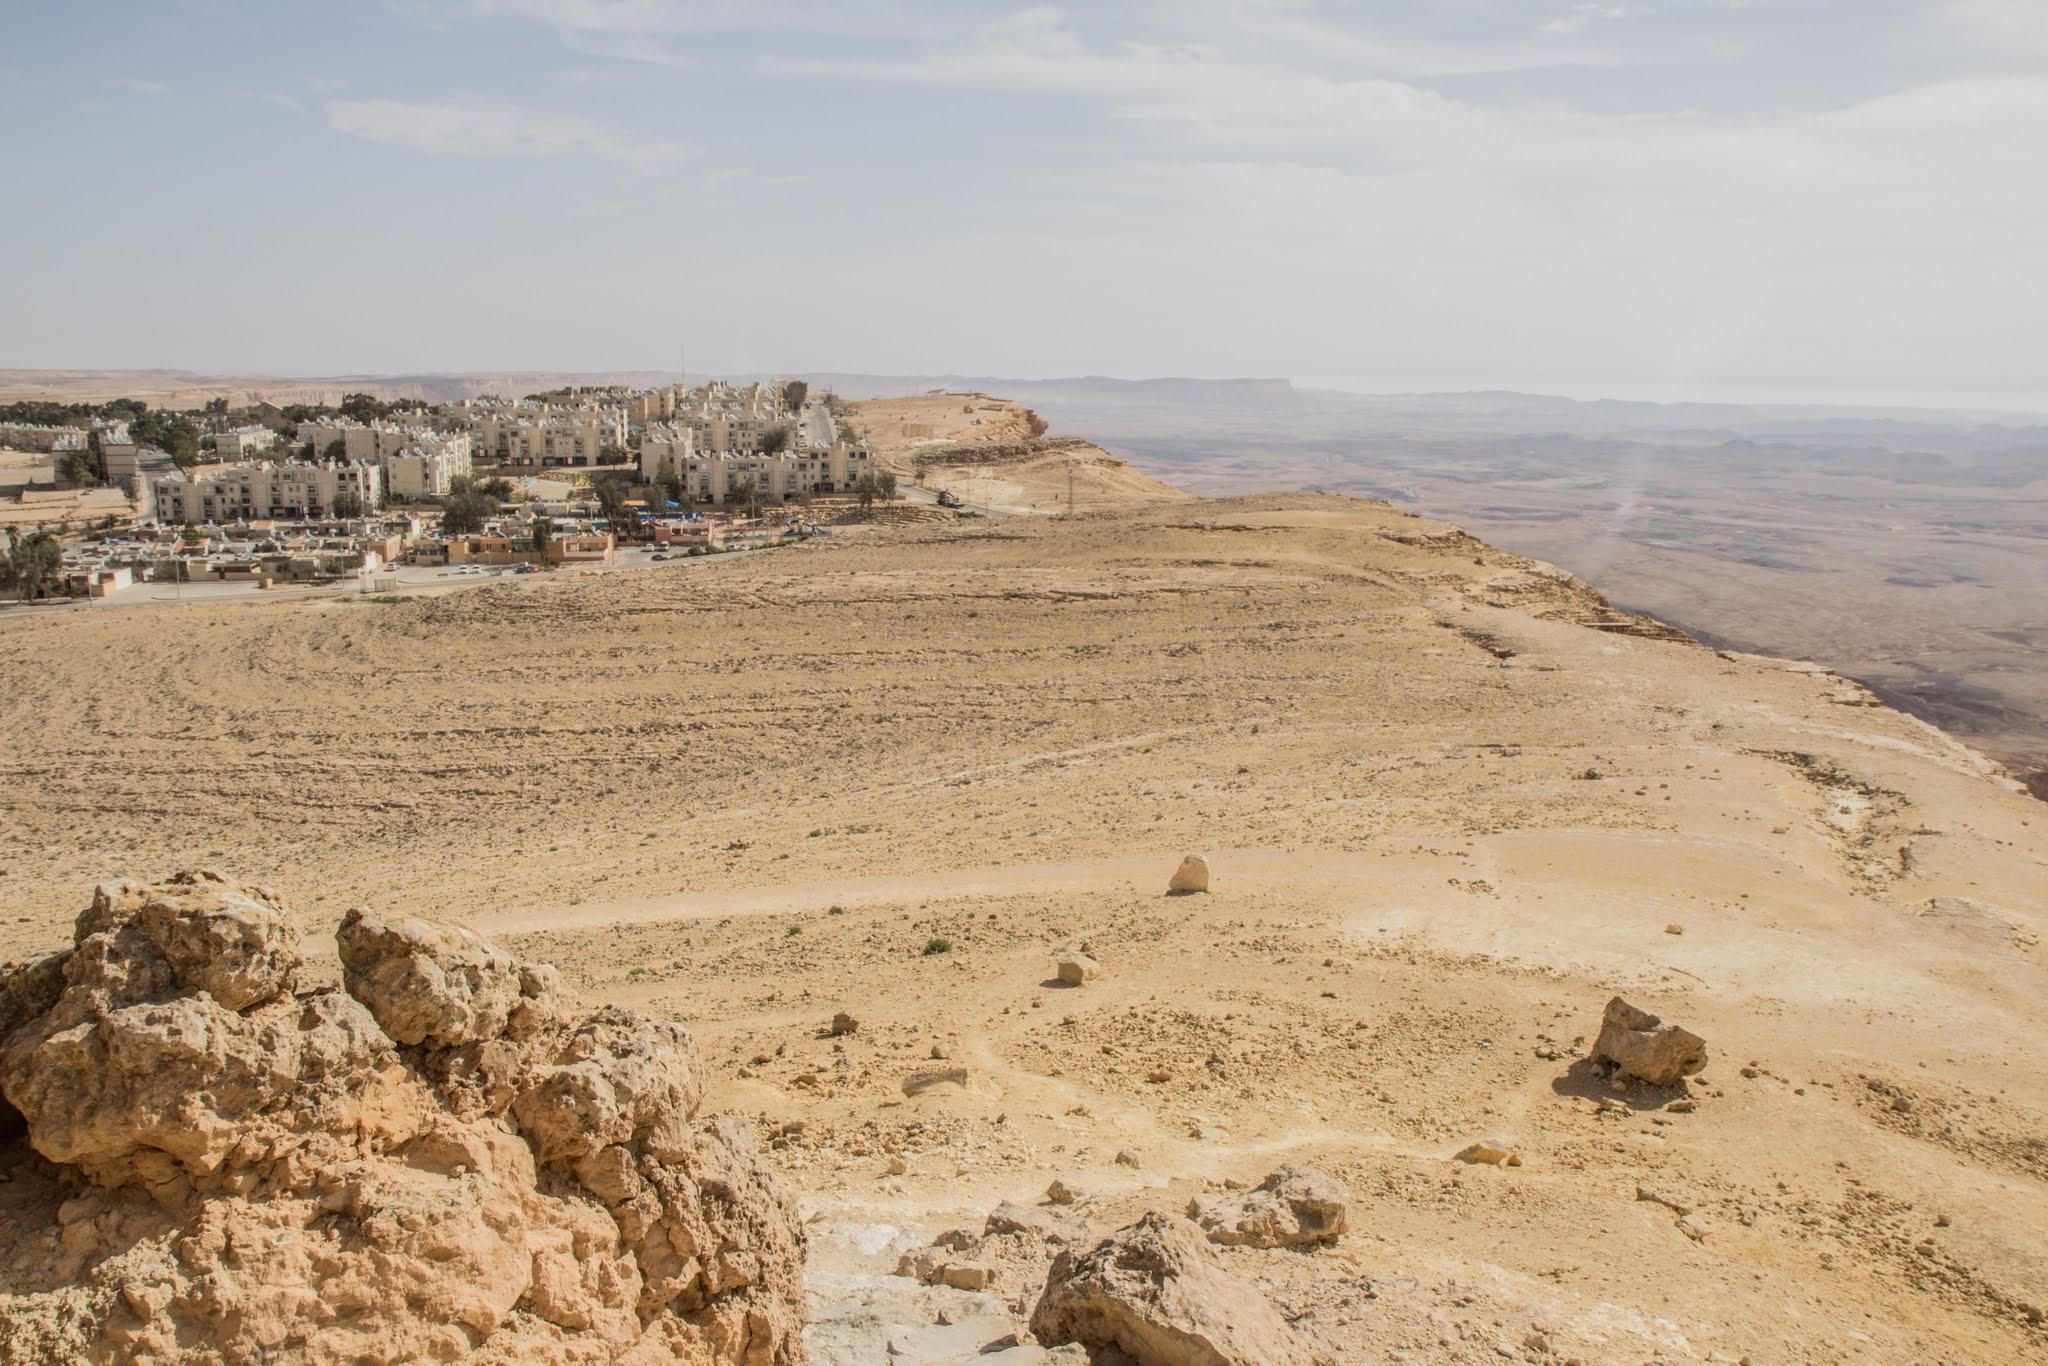 Mitzpe Ramon, Izrael, miasto nad kraterem